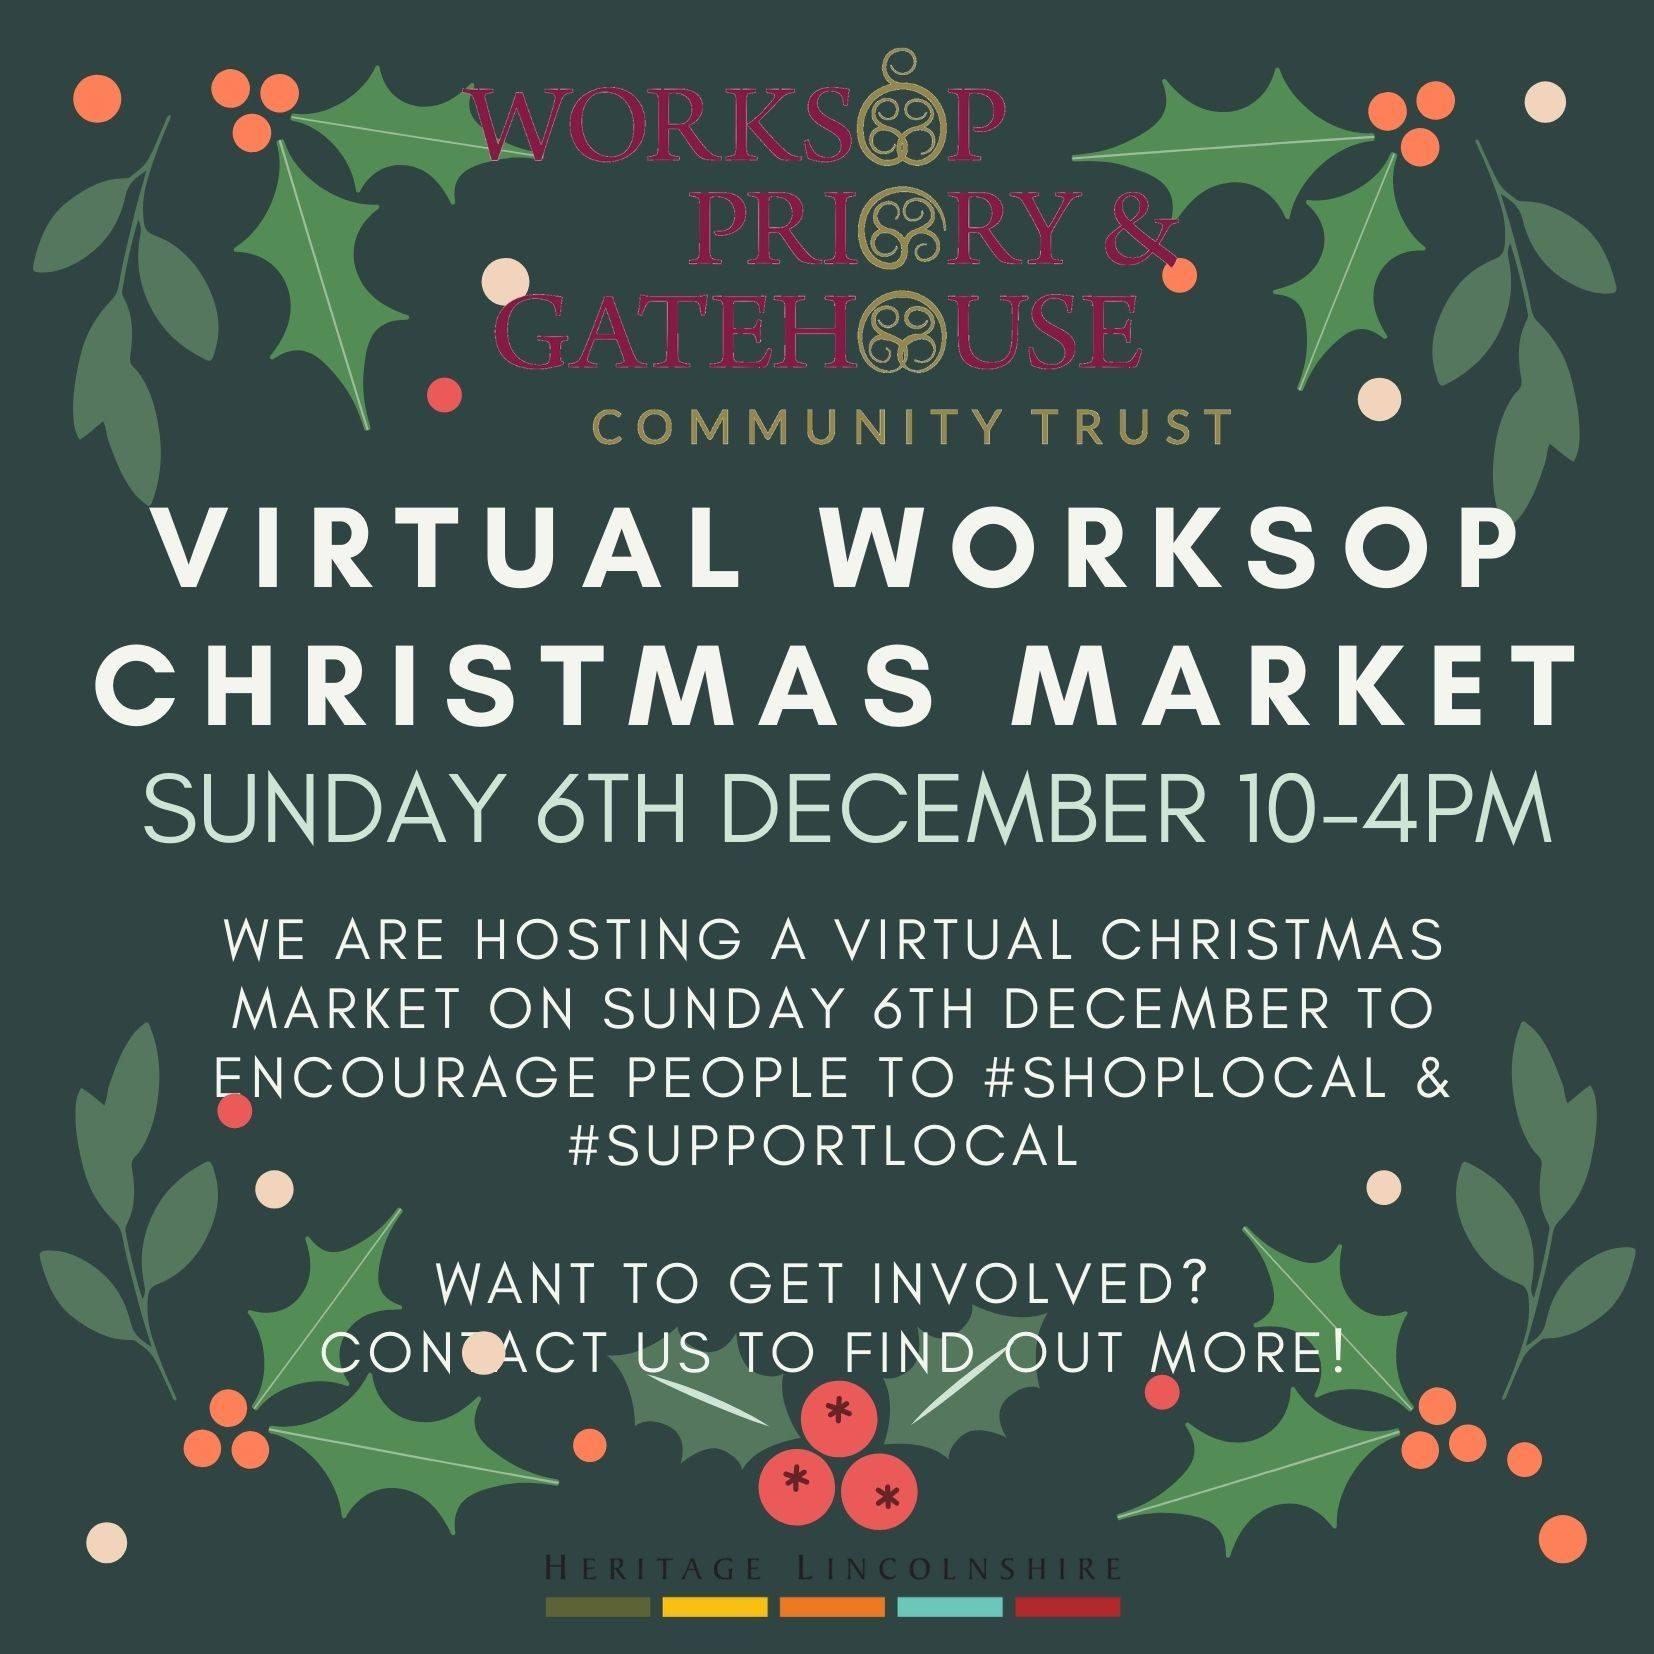 Worksop Priory & Gatehouse Community Trust virtual Christmas Fair 2020